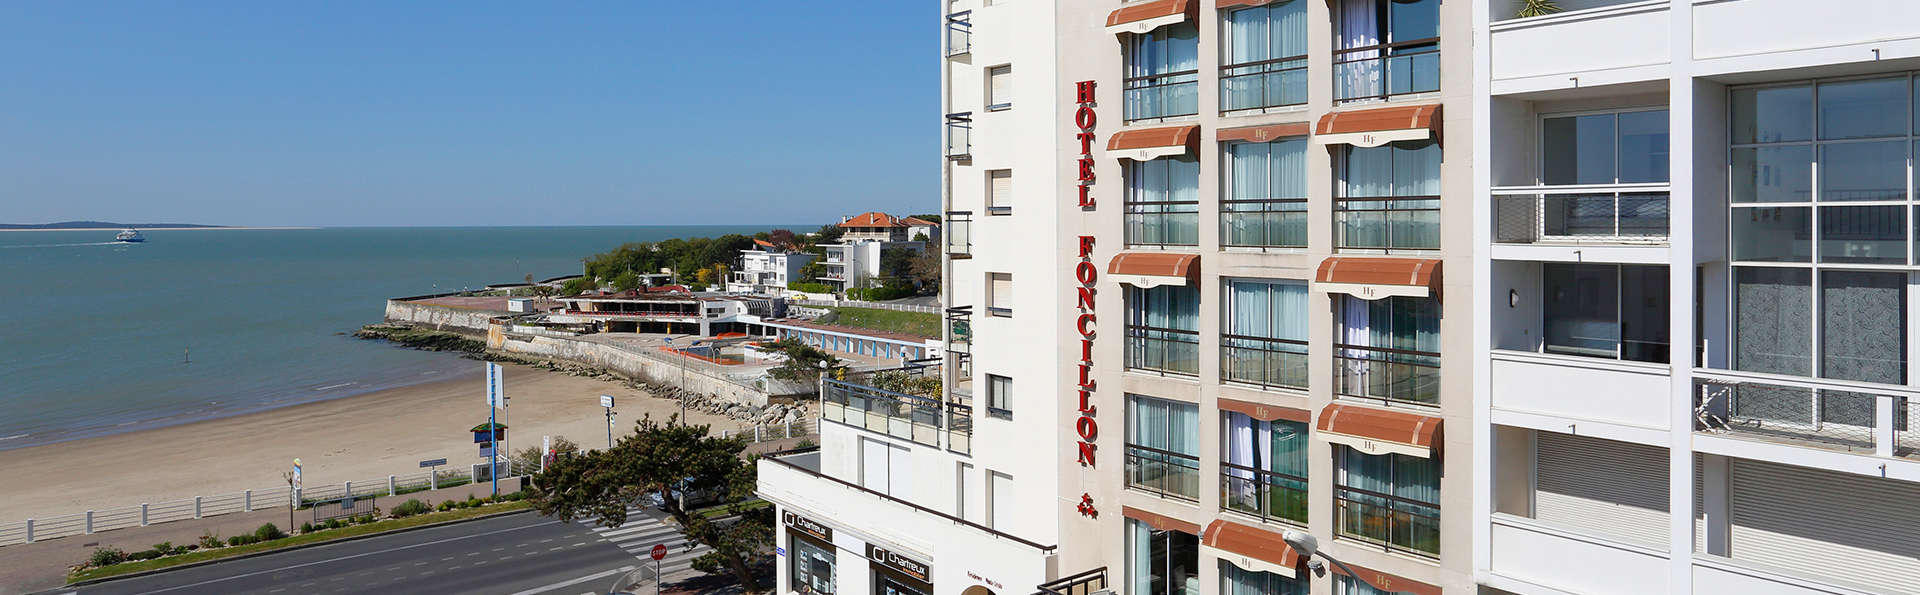 Hotel The Originals Royan Foncillon (ex Inter-Hotel) - EDIT_NEW_Front.jpg